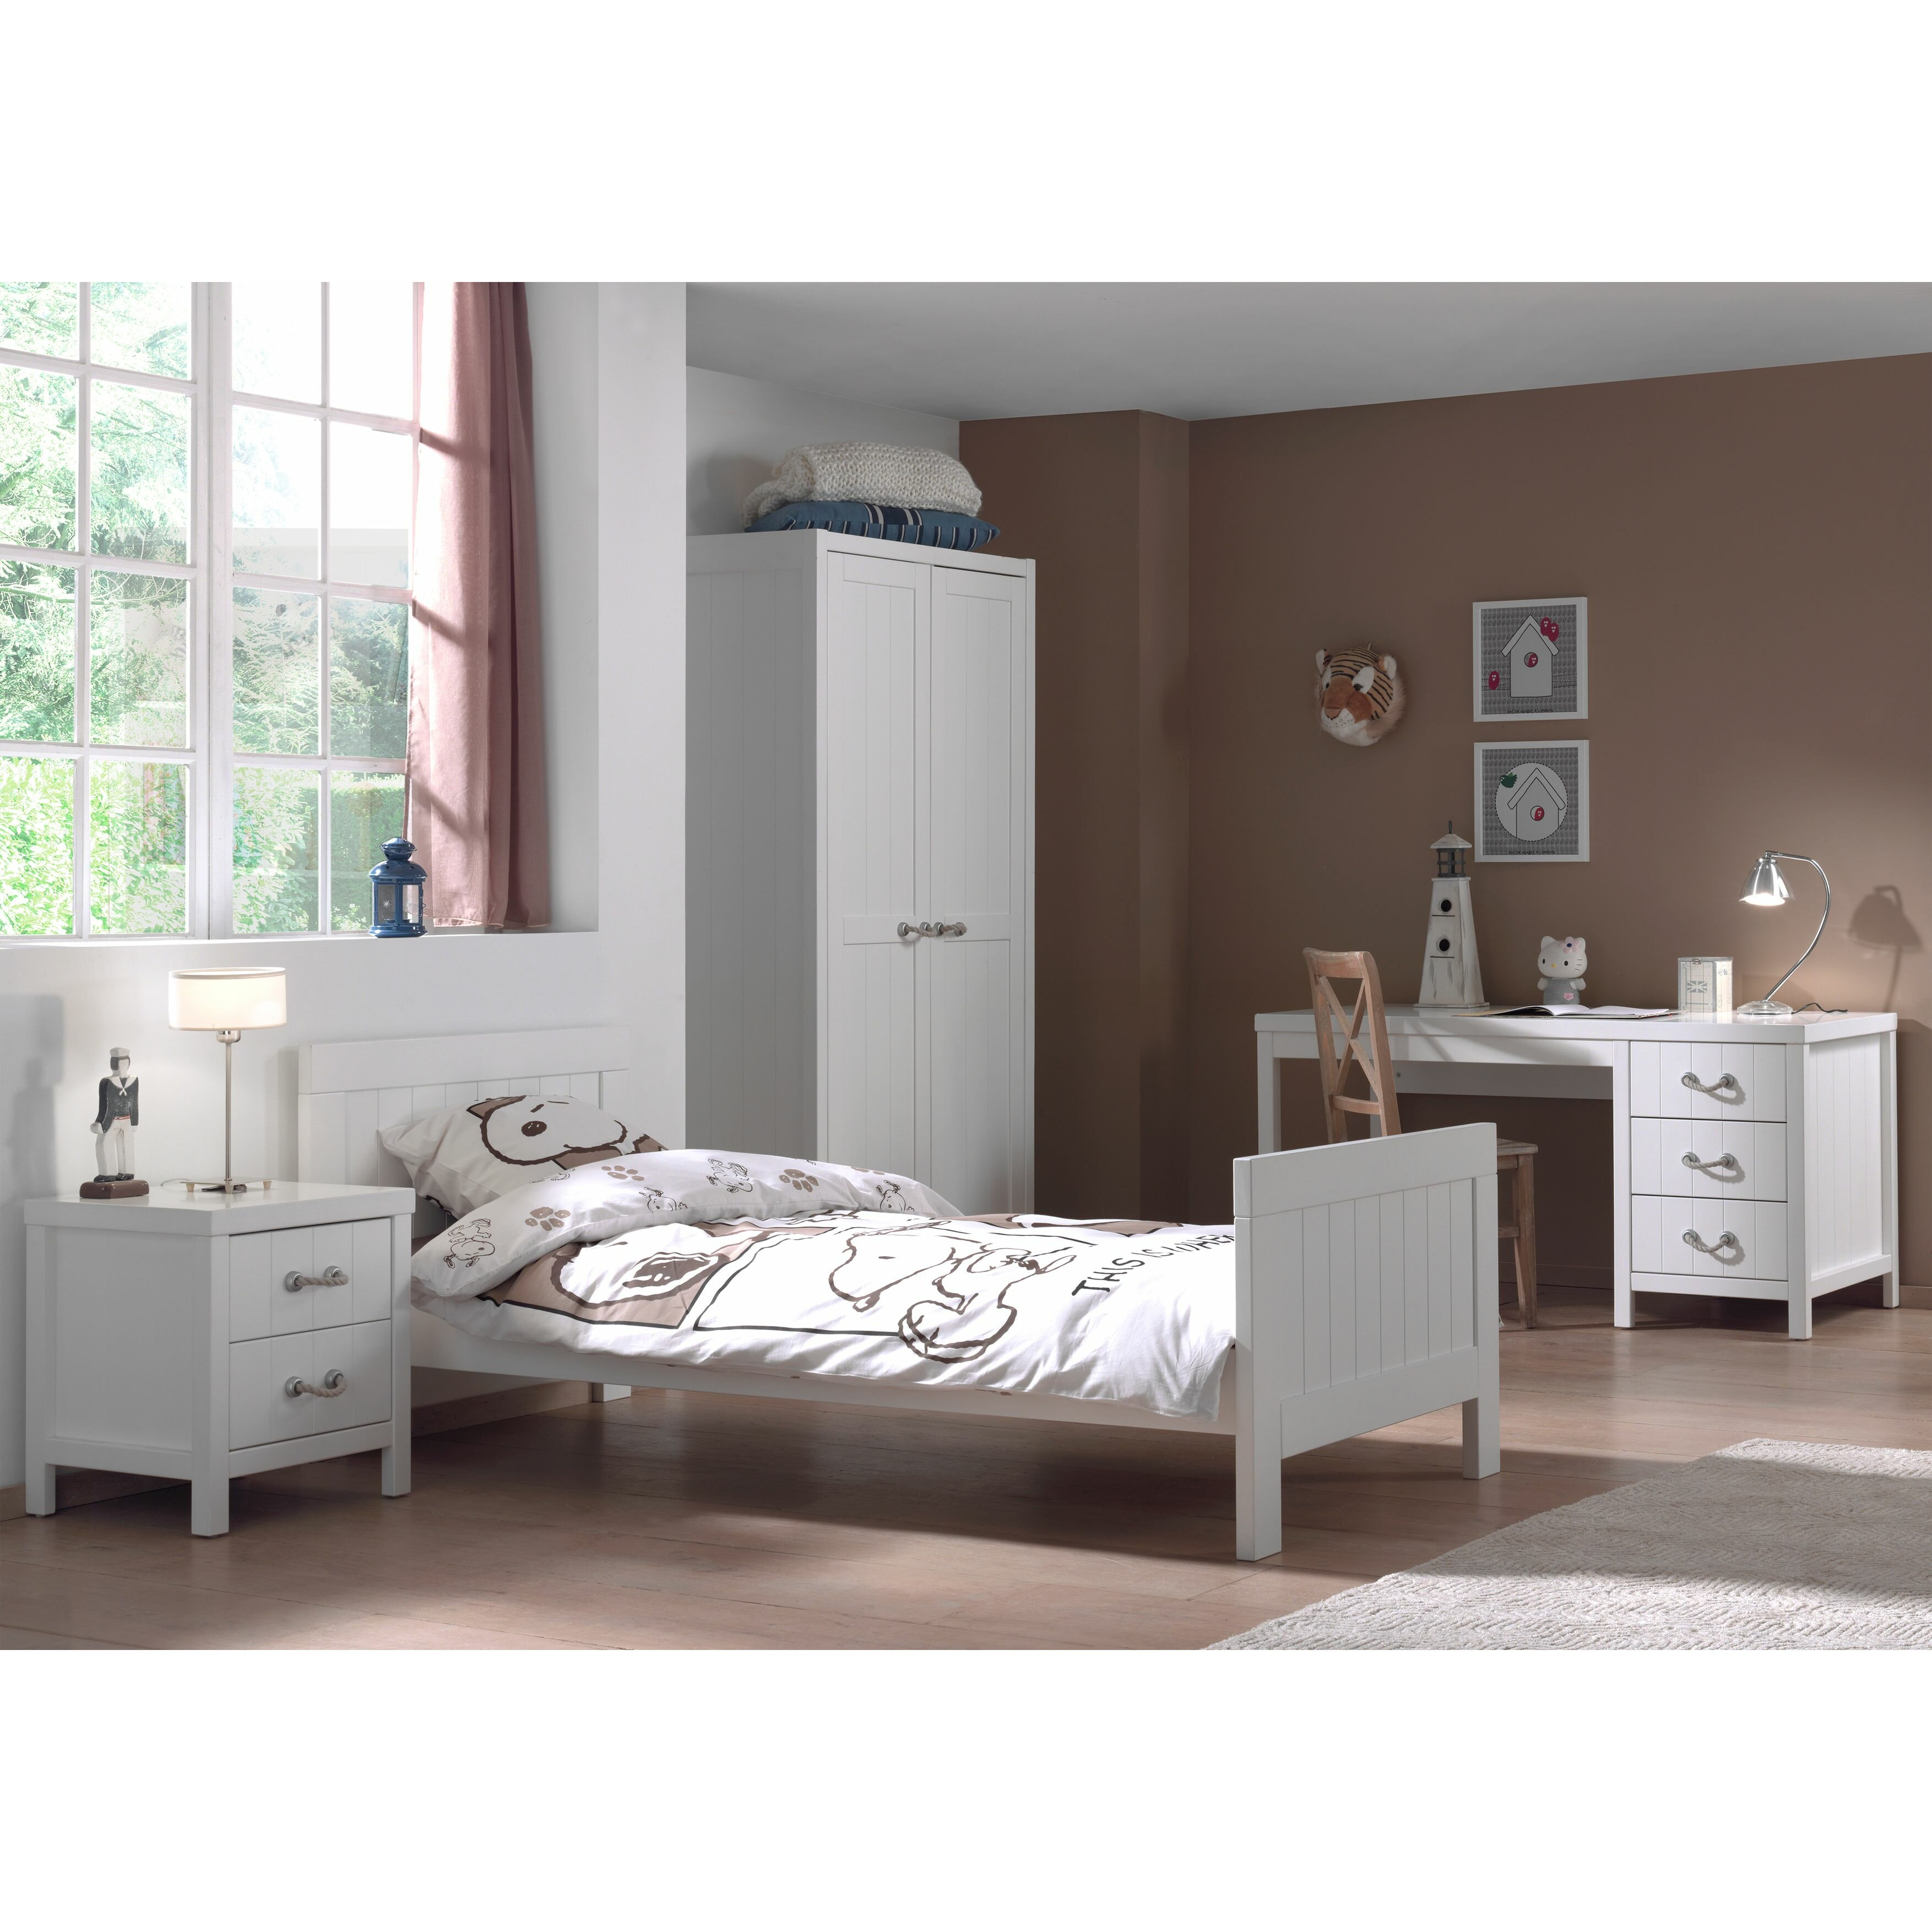 Vipack lewis 4 piece bedroom set wayfair uk for 4 piece bedroom furniture set